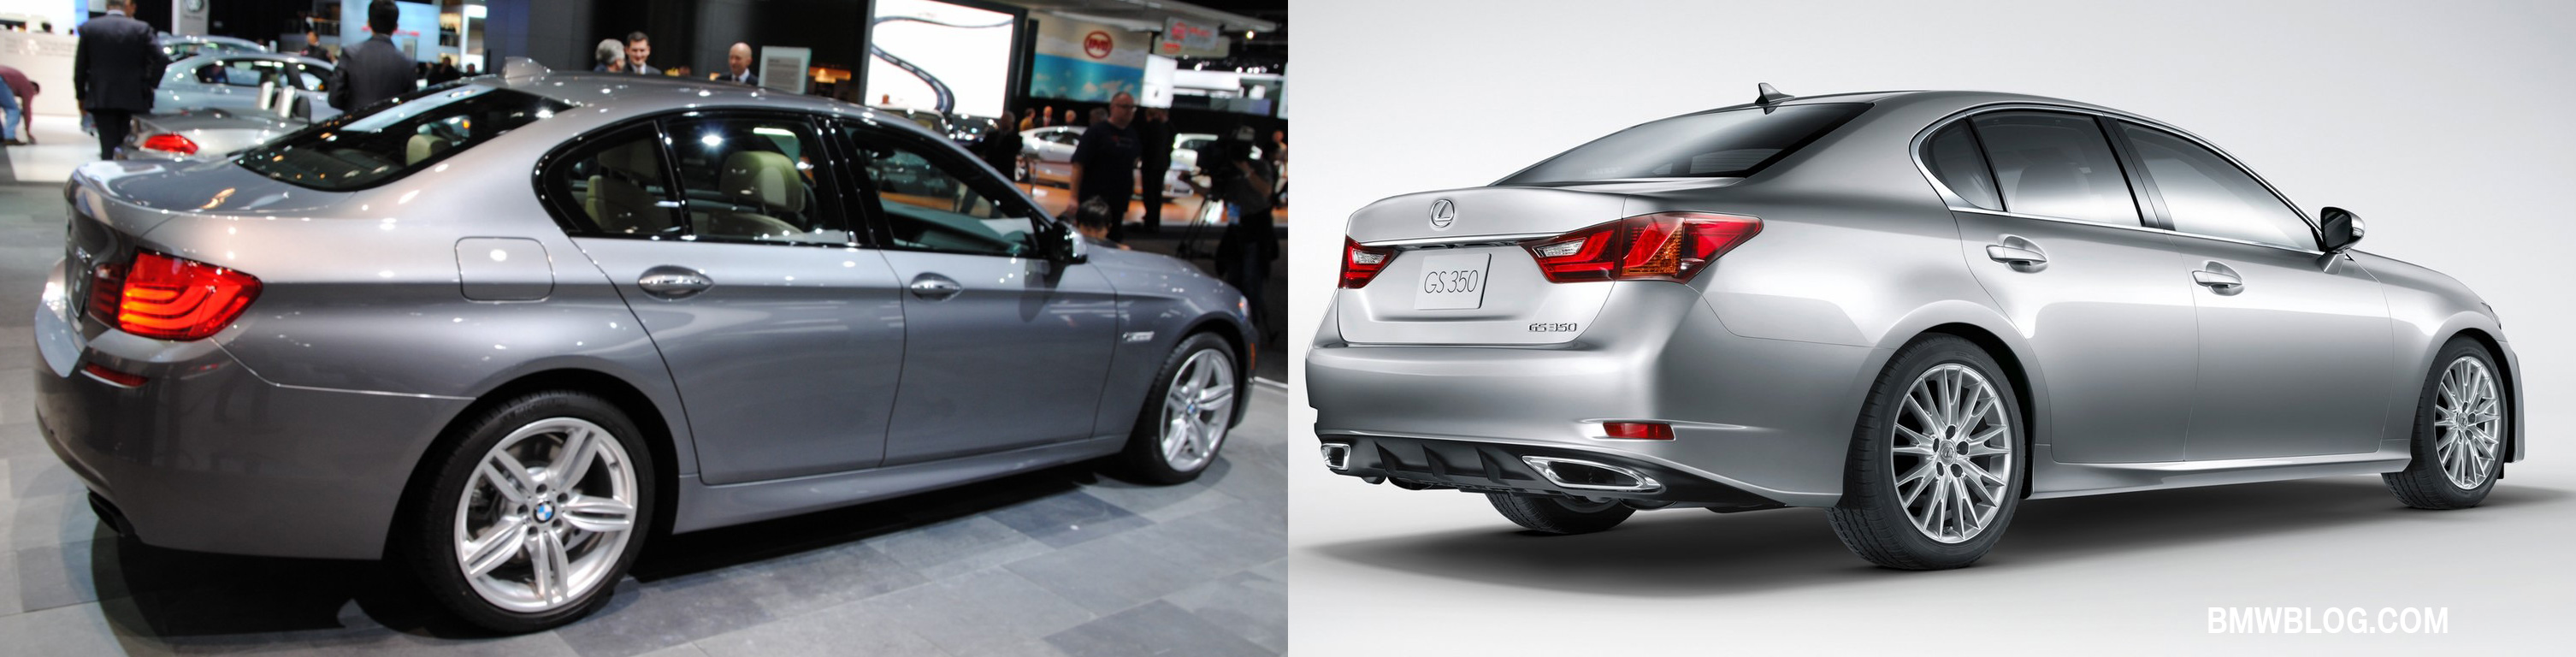 2013 lexus gs 350 vs bmw 535i